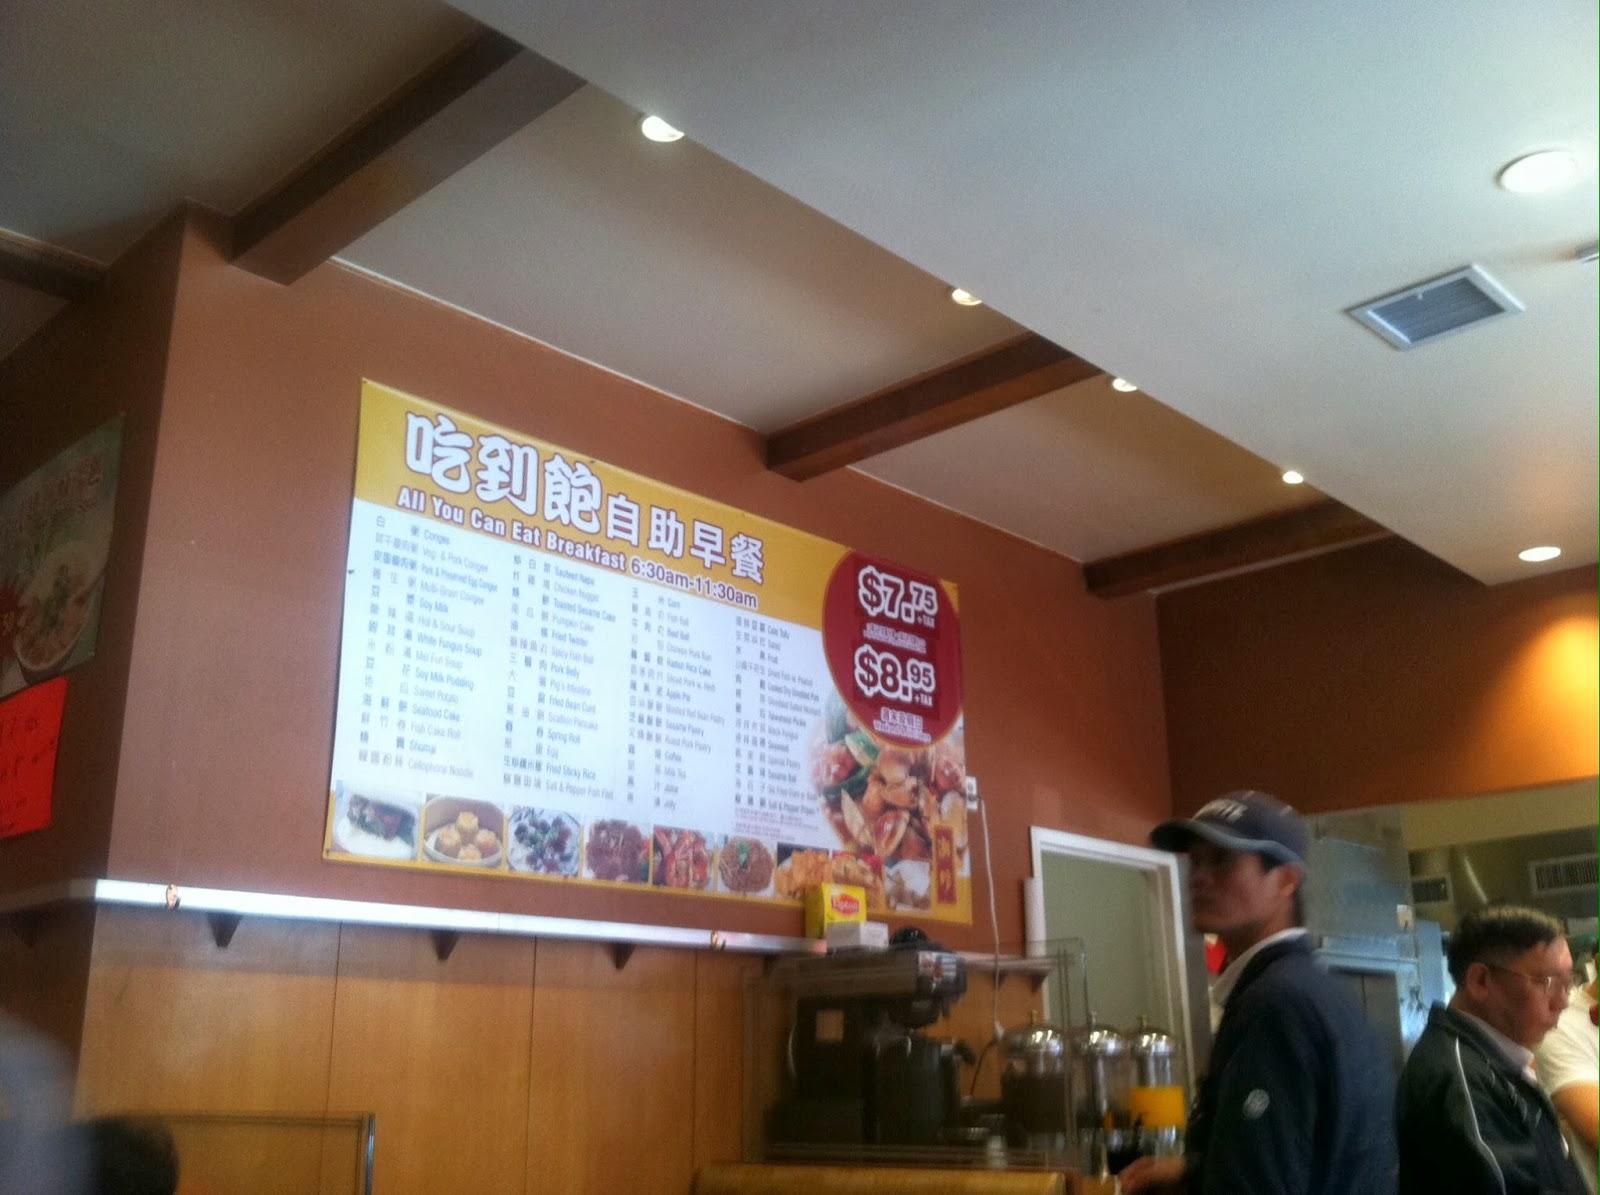 Peachy Danielle Sim Dmd Big Value Chinese Breakfast Buffet Download Free Architecture Designs Intelgarnamadebymaigaardcom